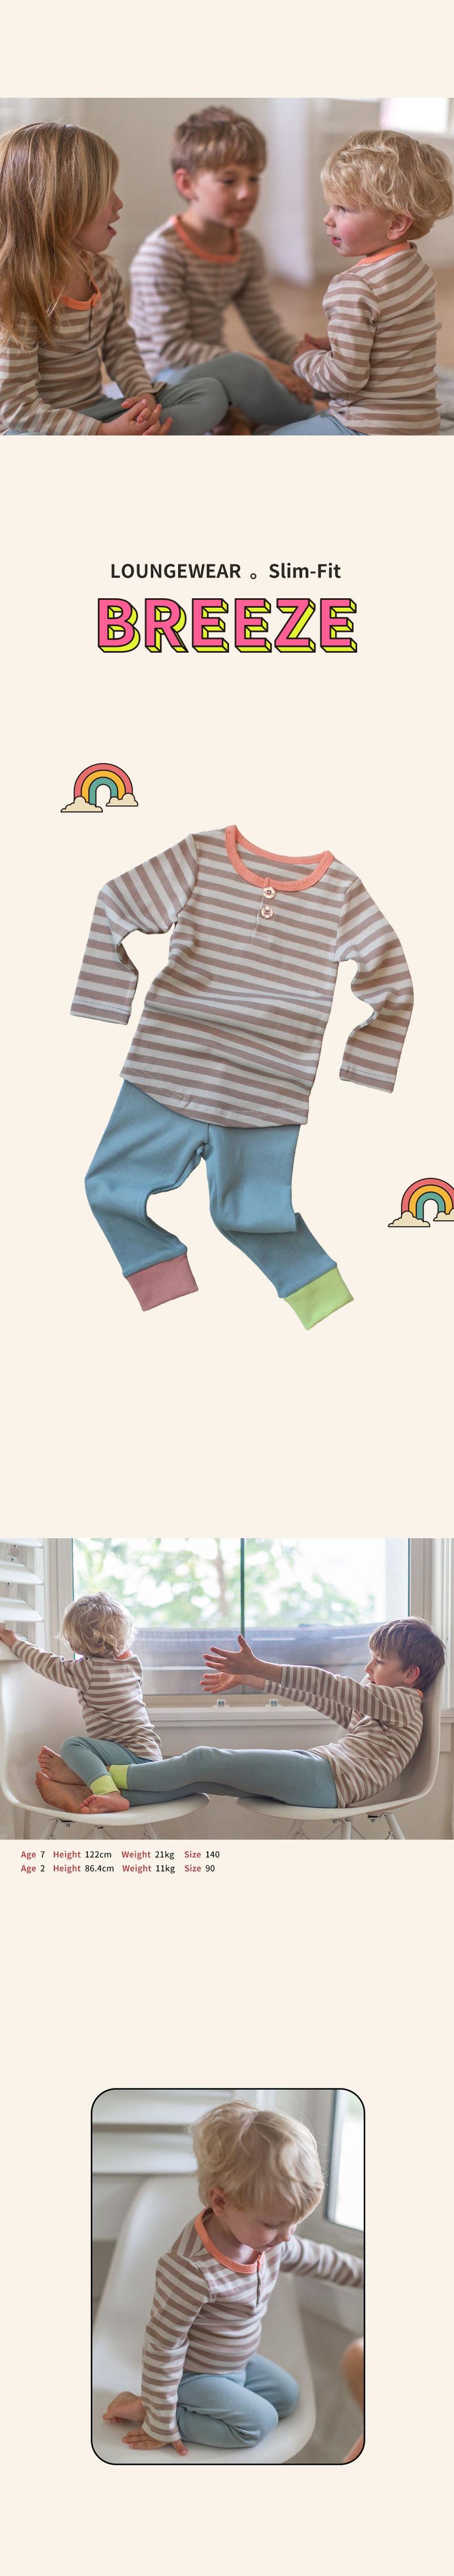 KOKACHARM - Korean Children Fashion - #Kfashion4kids - Breeze Loungewear